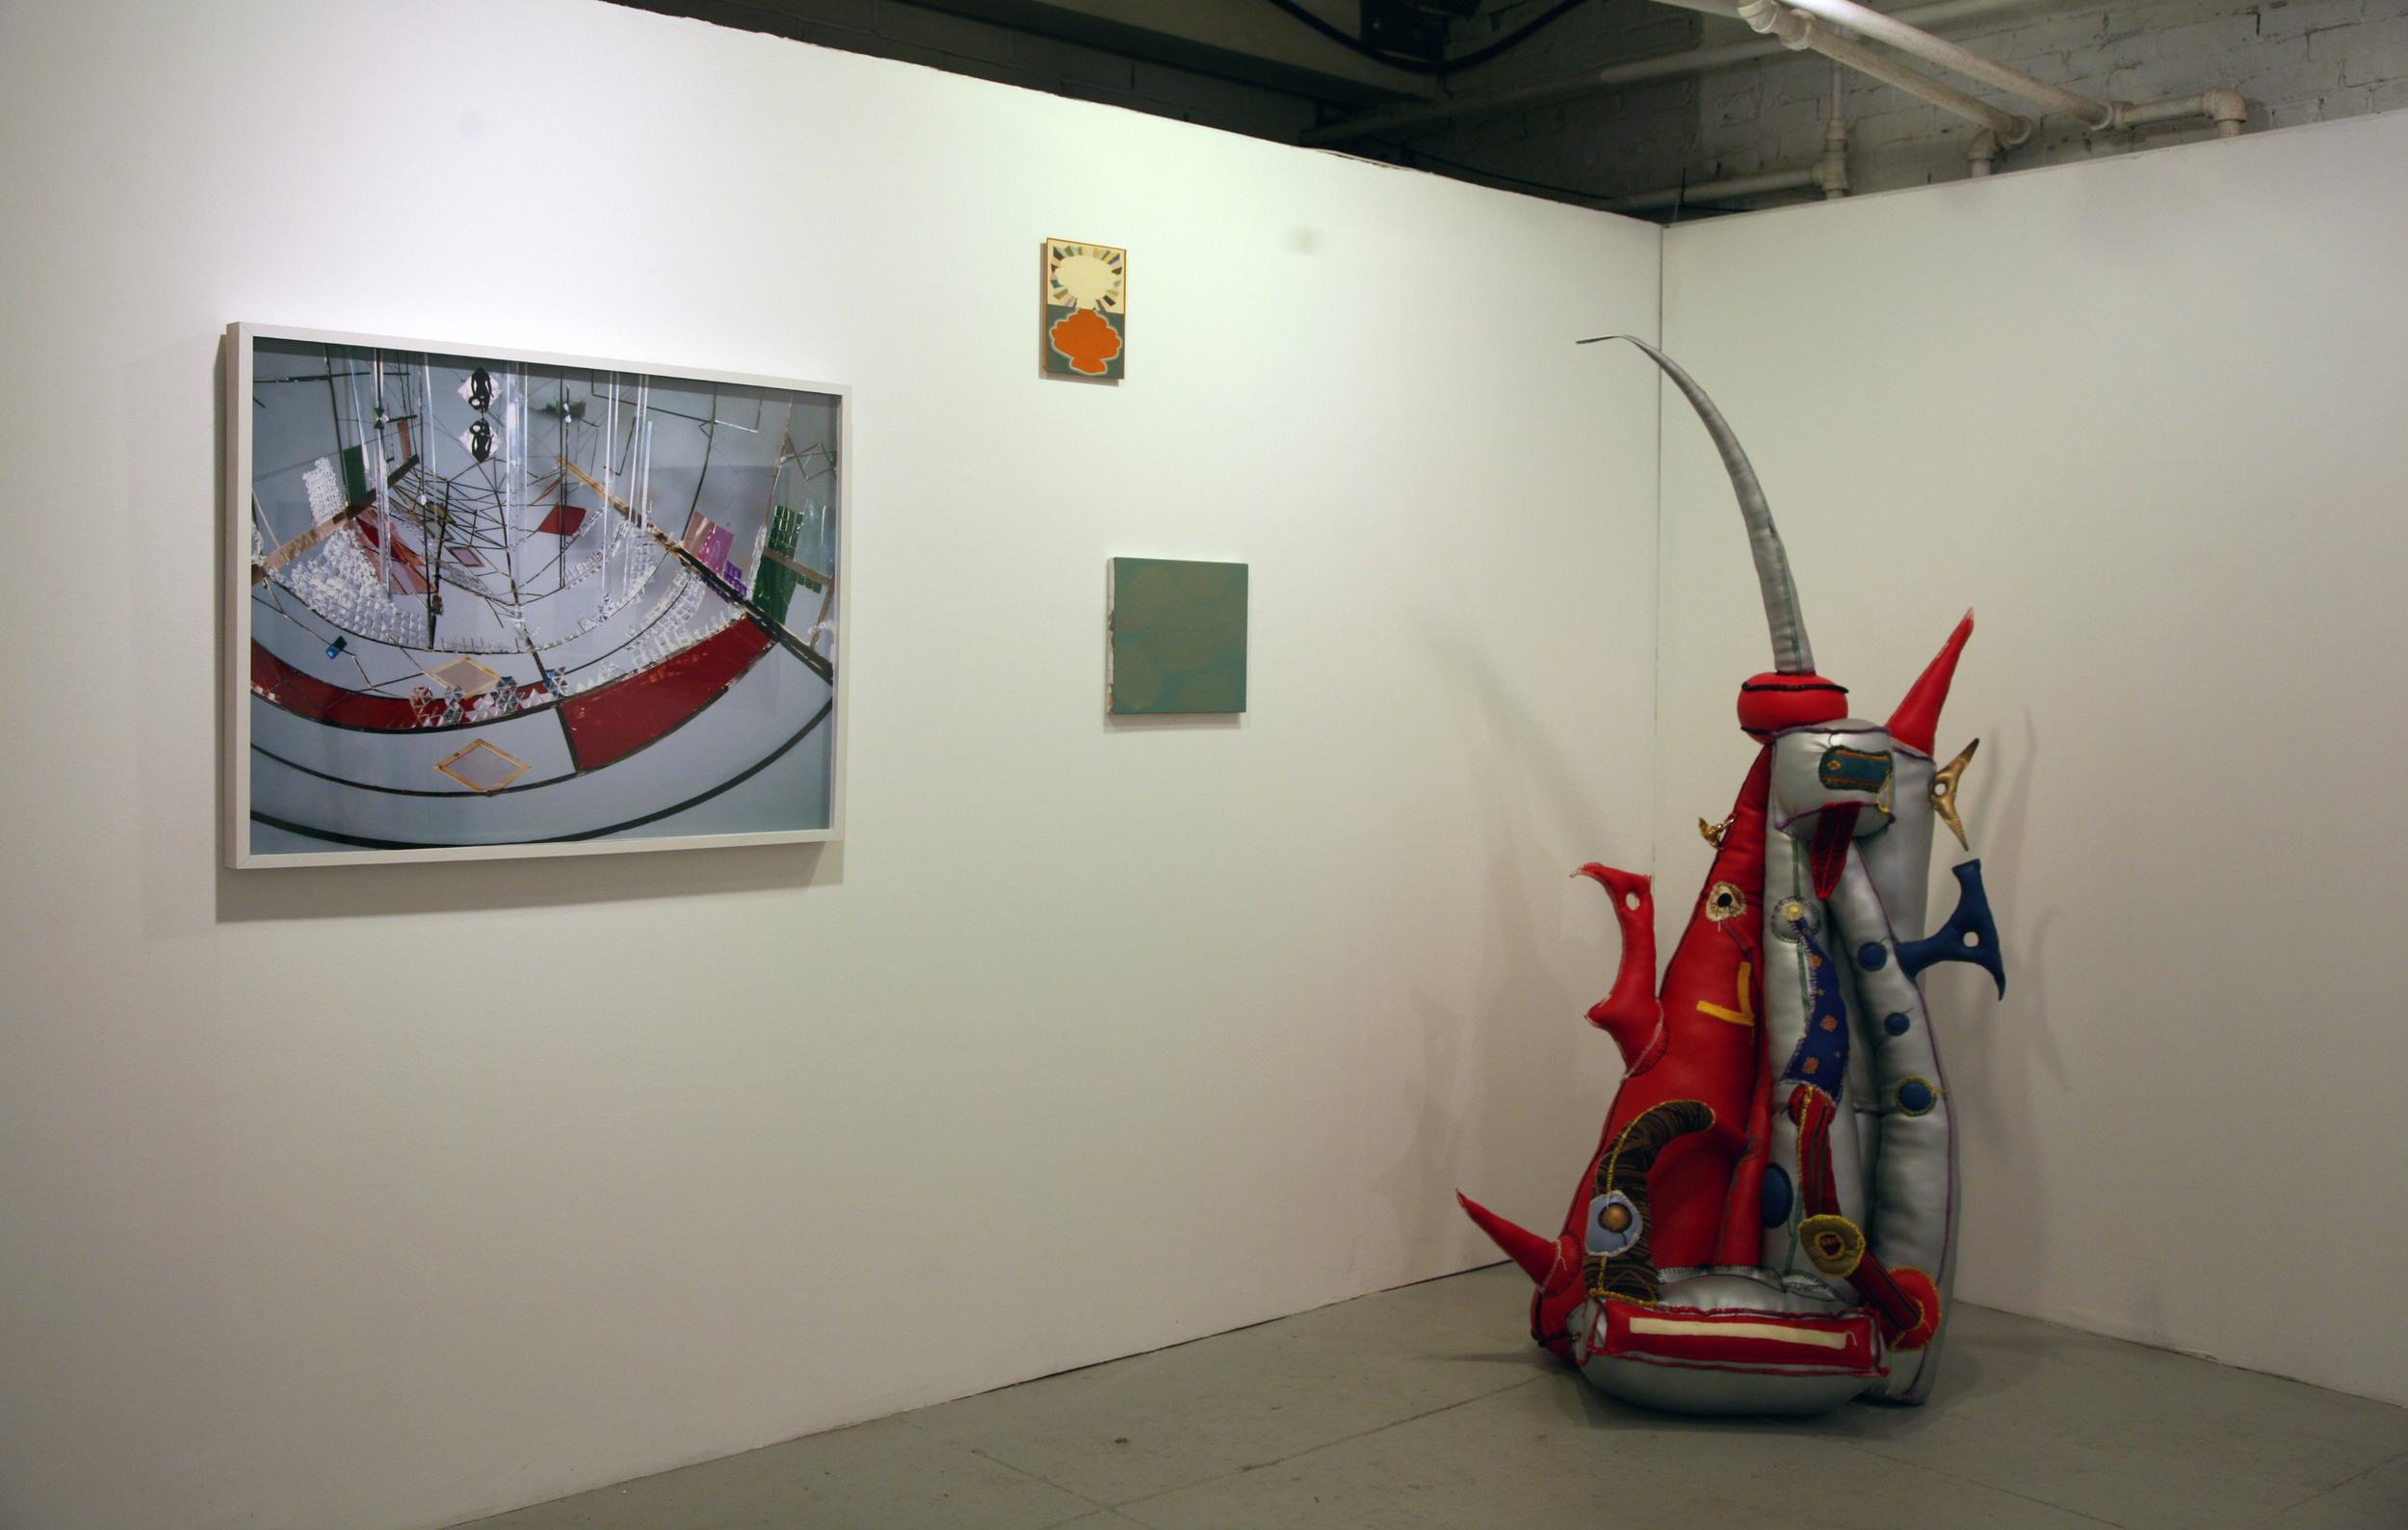 Installation View. Yamini Nayar, Tom Buckhardt, Robert Bordo, R.M. Fischer.